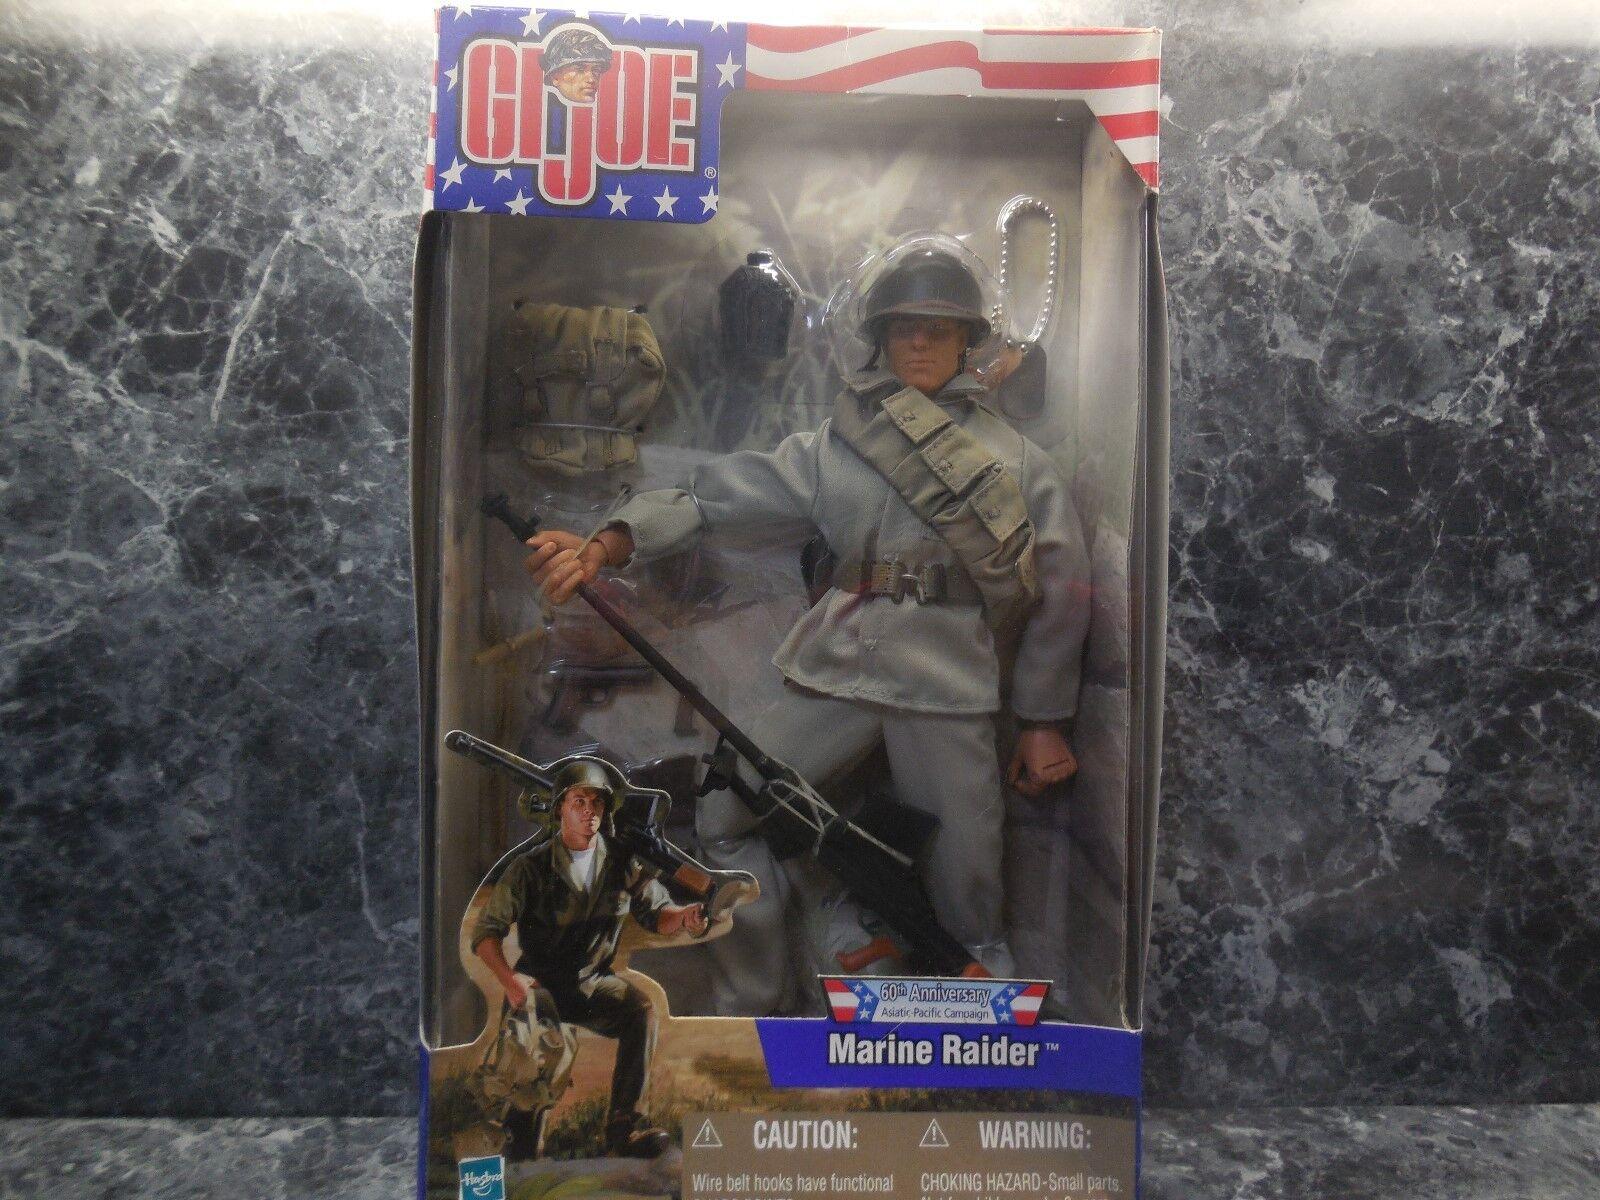 2001 g.i.joe marine raider new